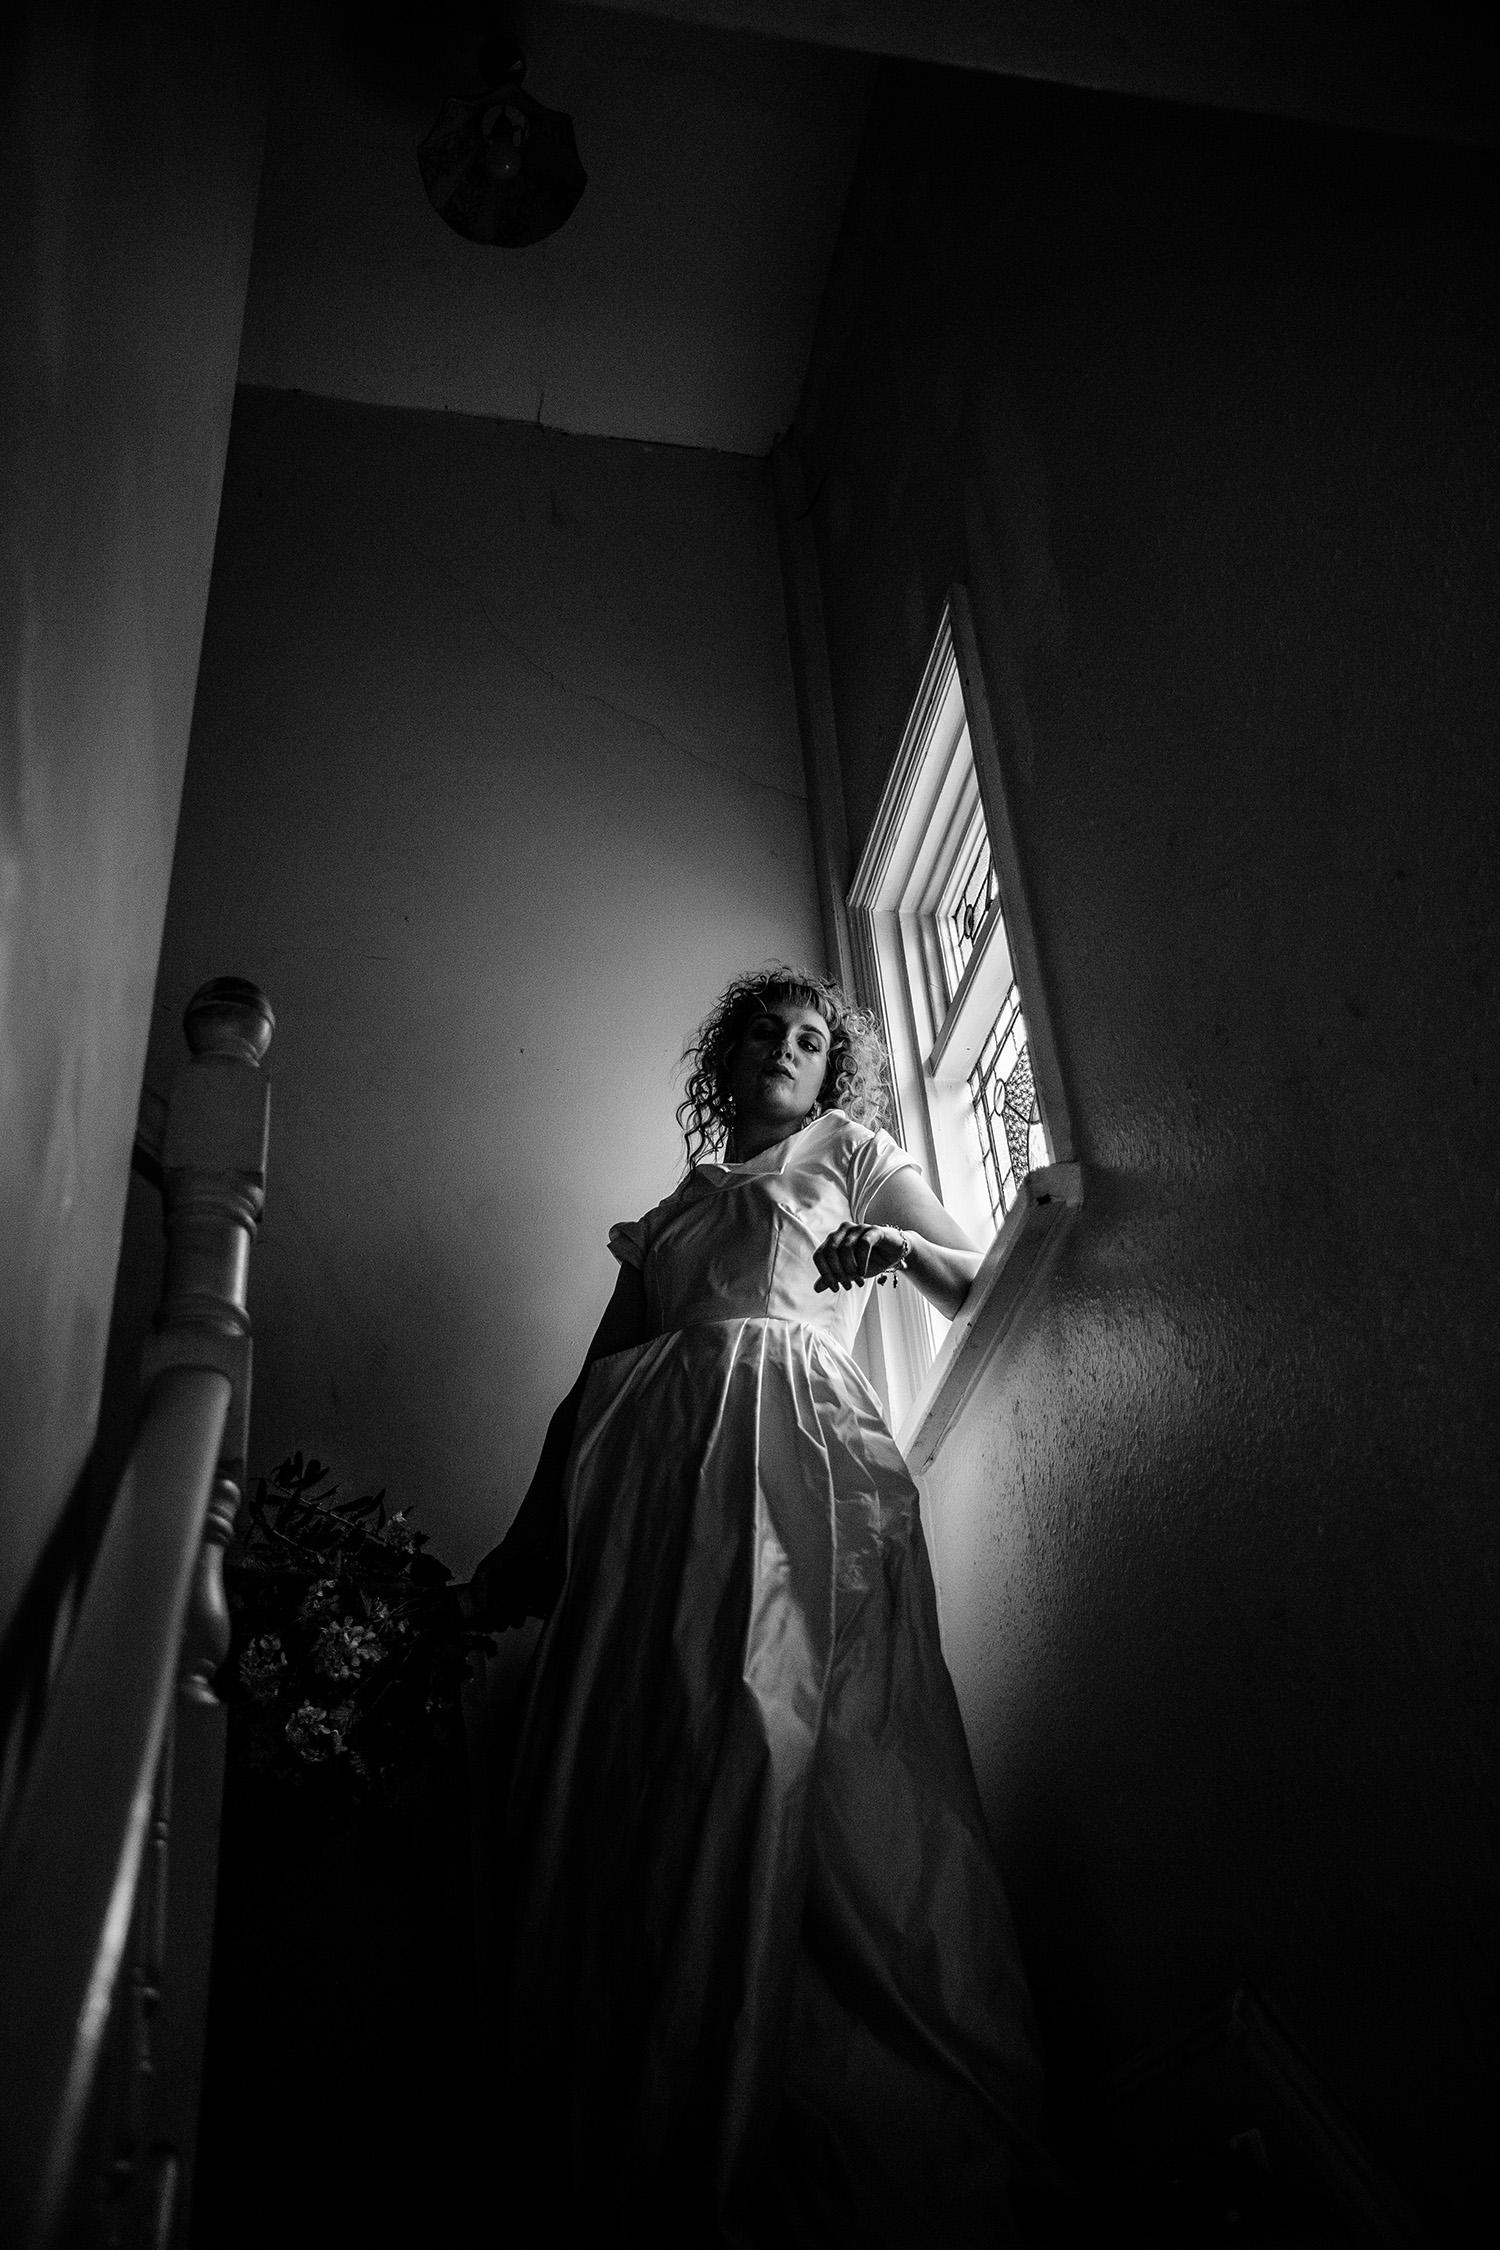 Manchester Wes Anderson Village Hall Wedding 029.jpg